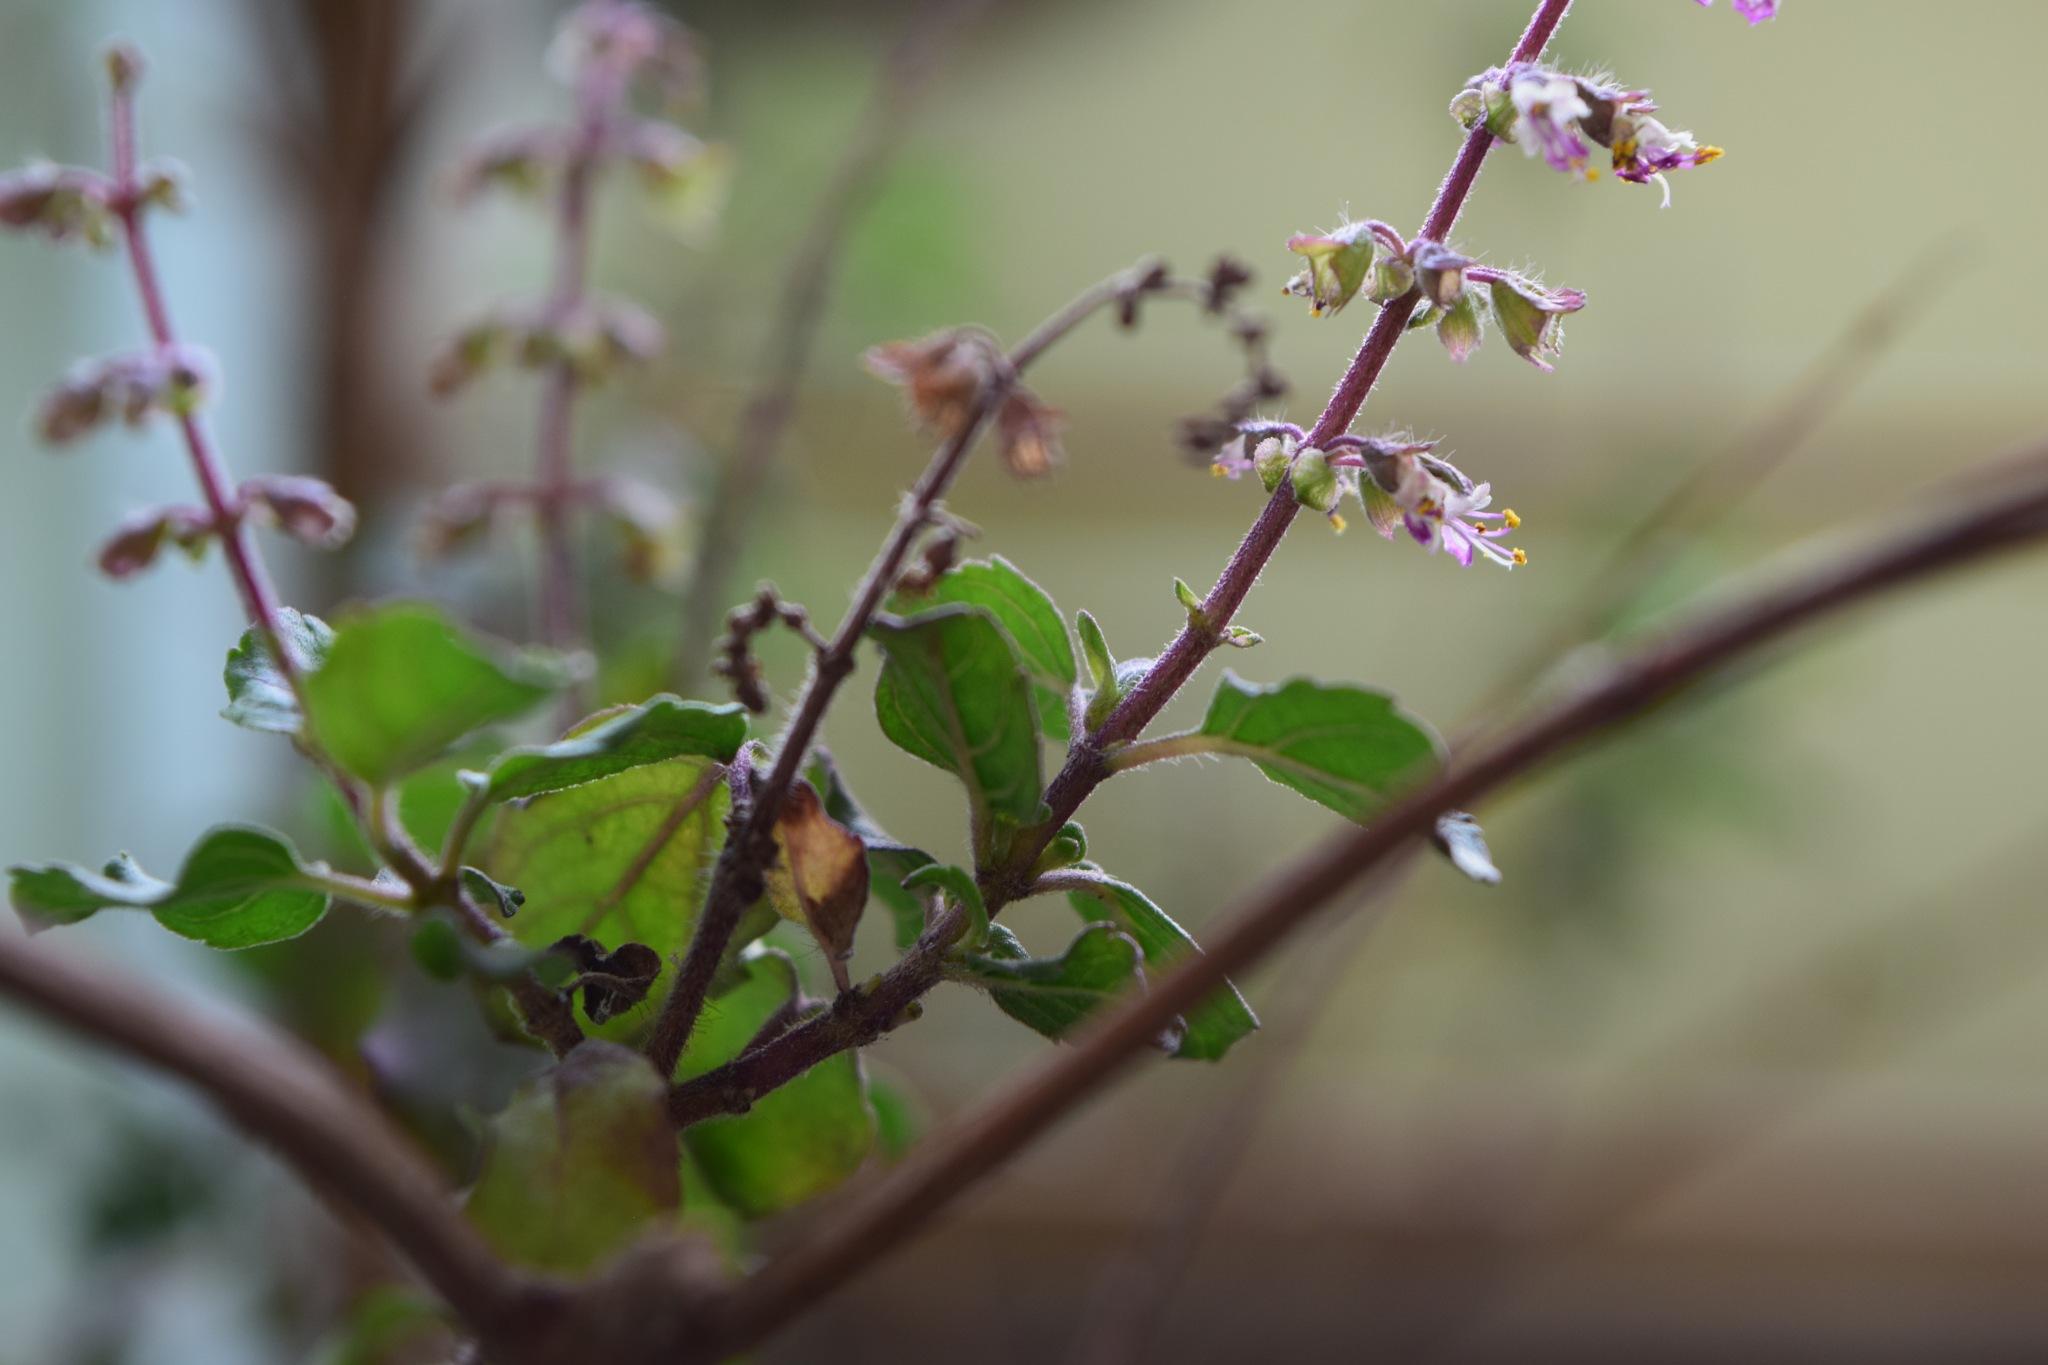 Ocimum tenuiflorum by Avinash Sharma